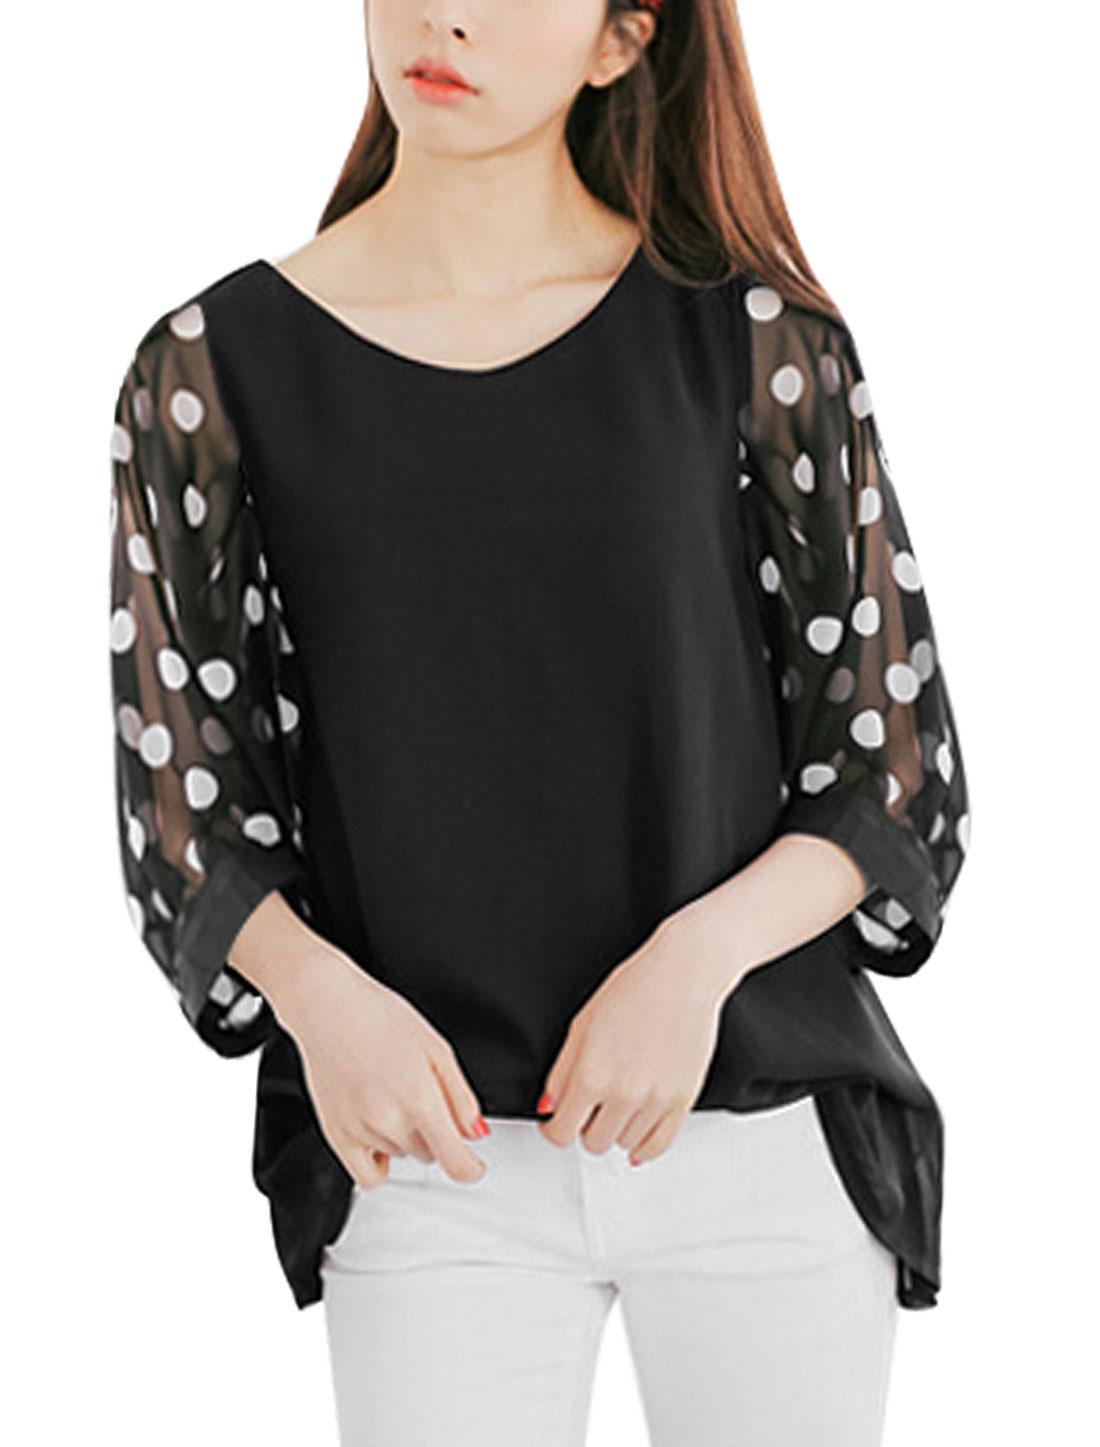 Ladies Round Neck 3/4 Semi Sheer Sleeves Polka Dots Chiffon Tops Black XS